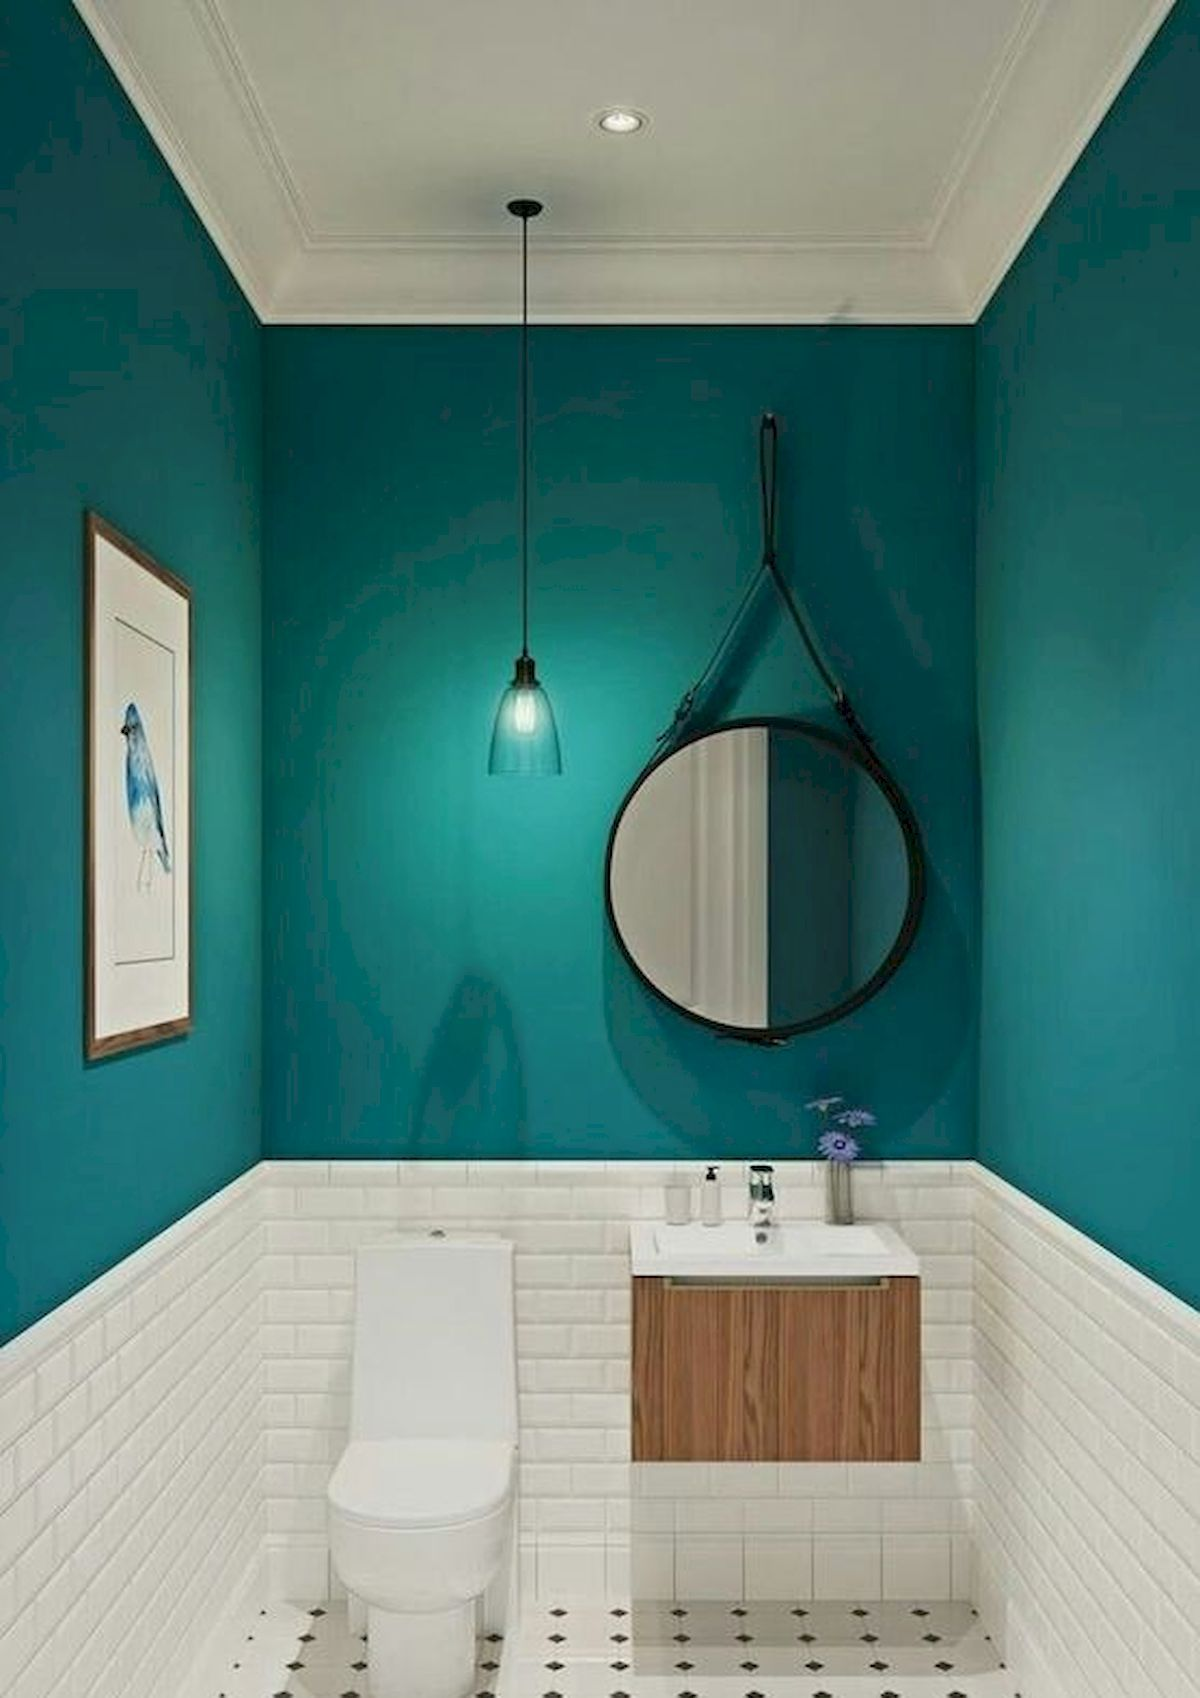 50 Stunning Small Bathroom Makeover Ideas - CoachDecor.com #downstairstoilet